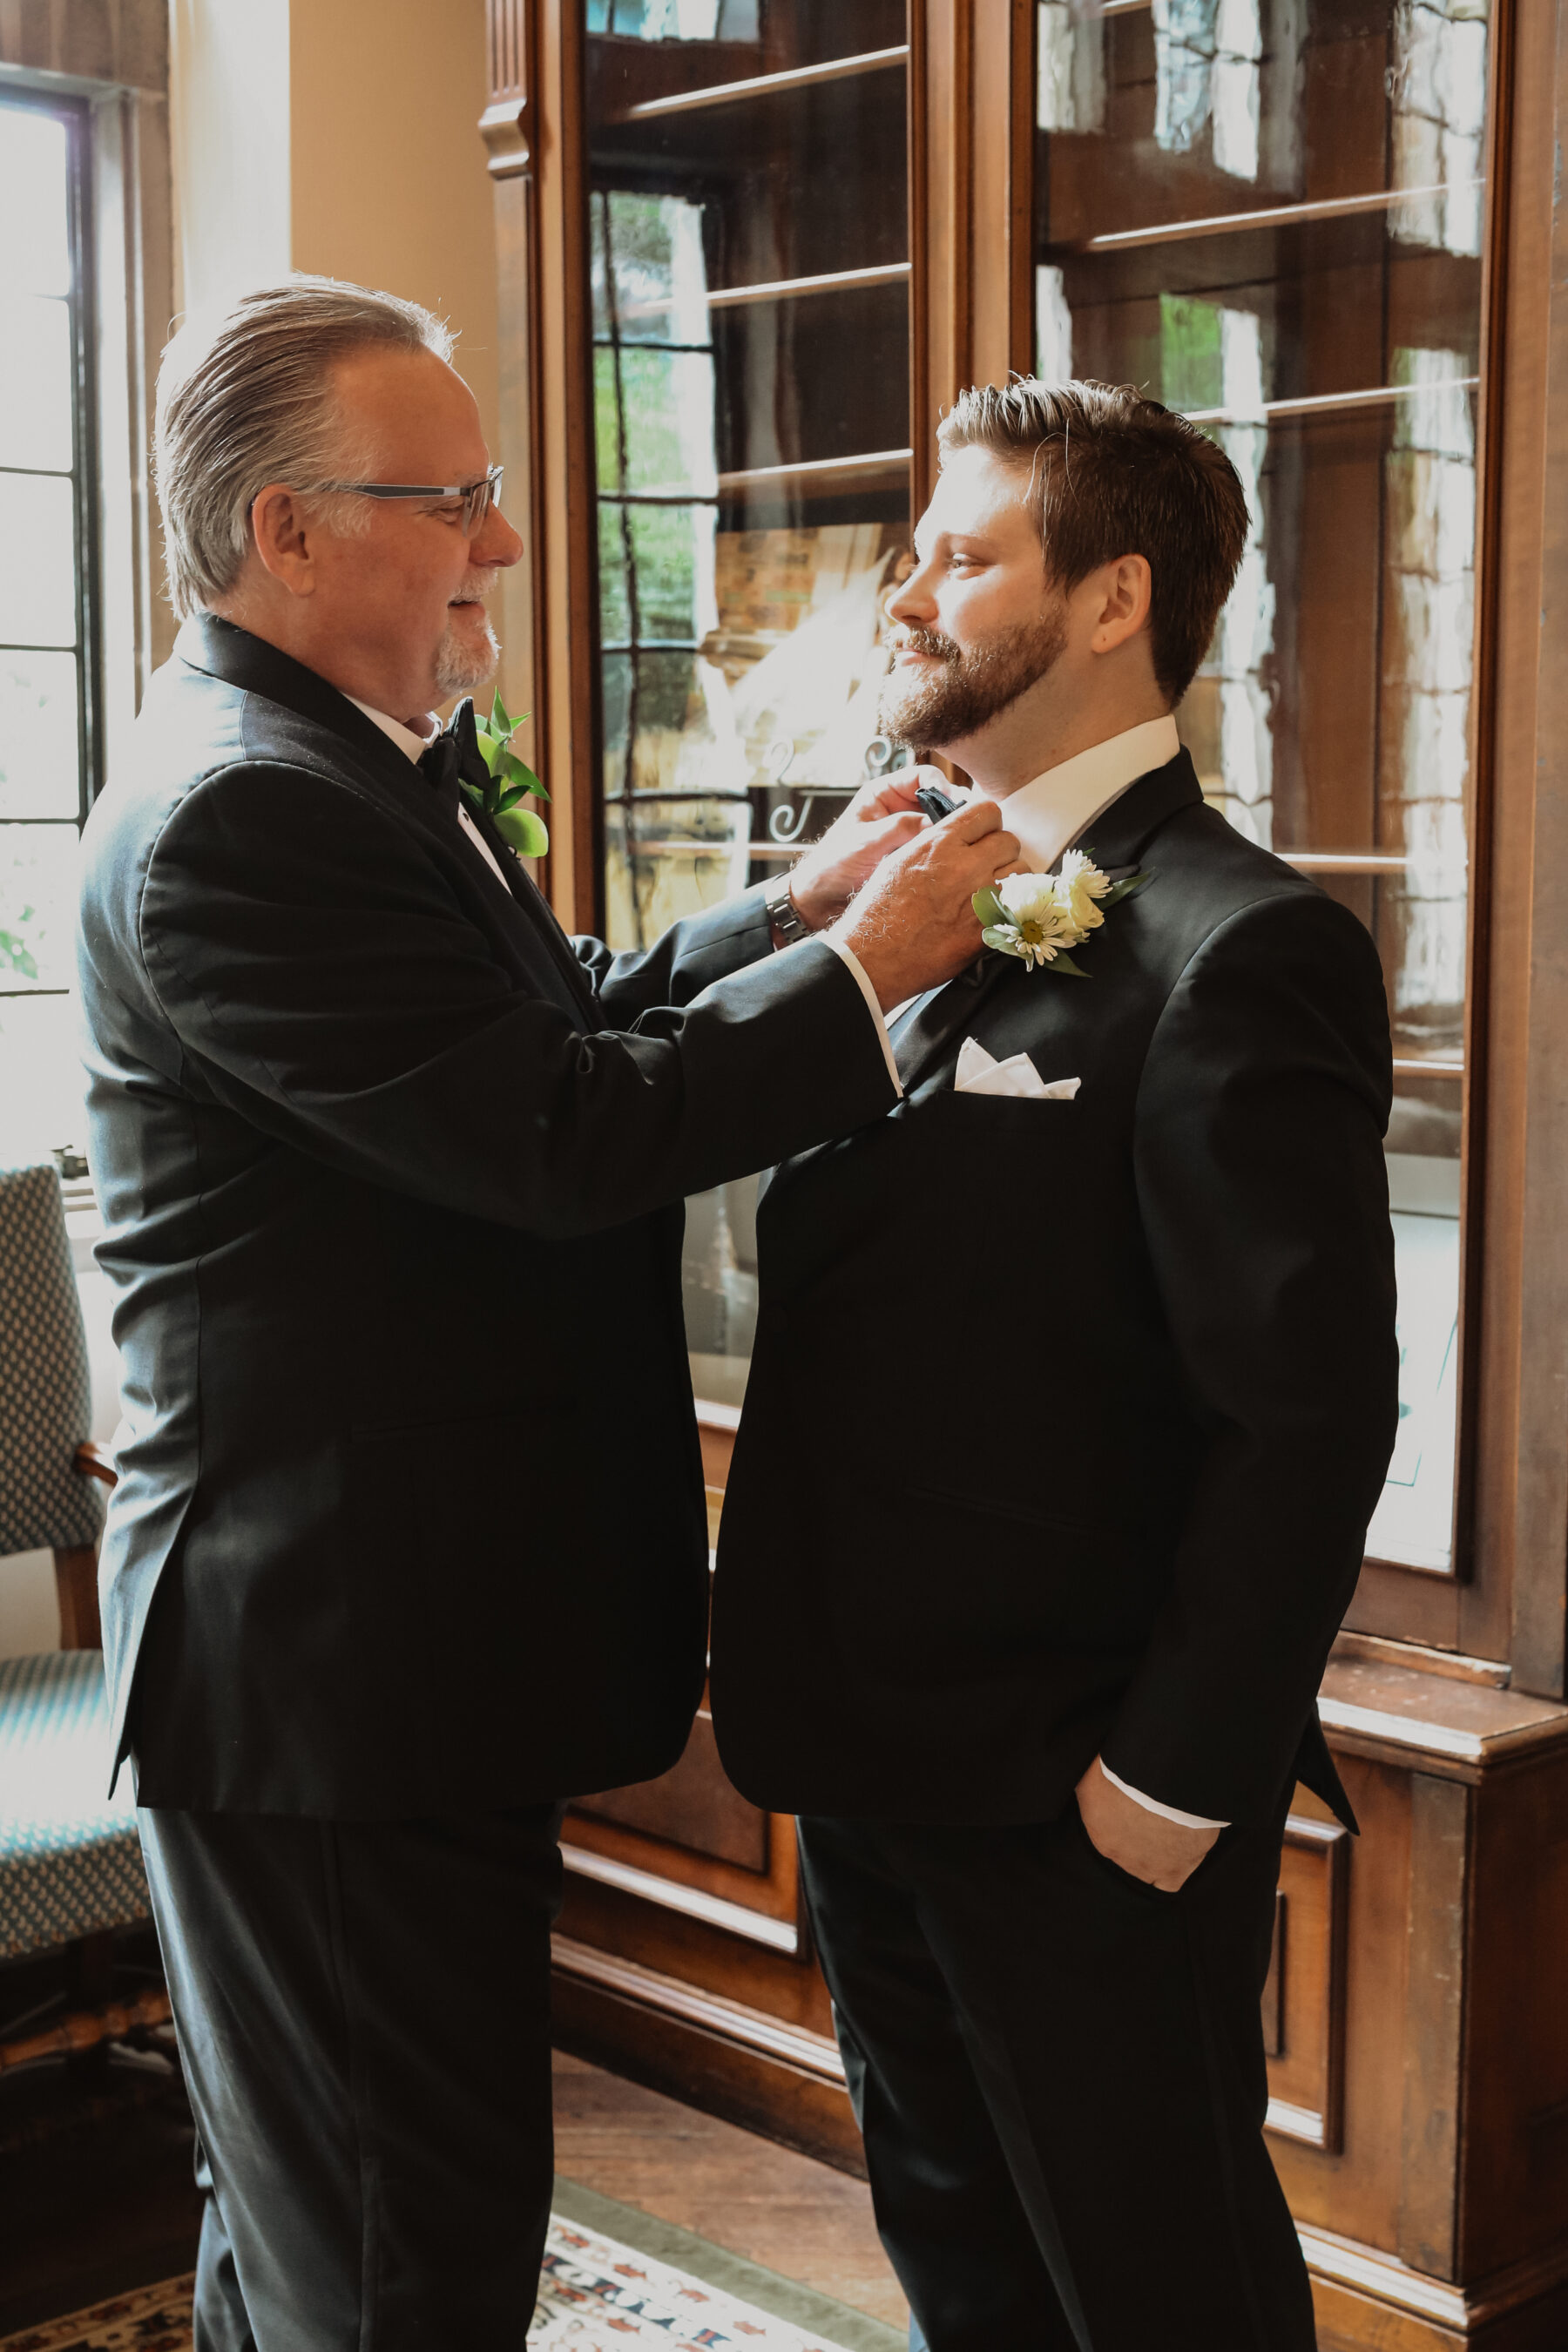 Groom getting ready for wedding | Nashville Bride Guide